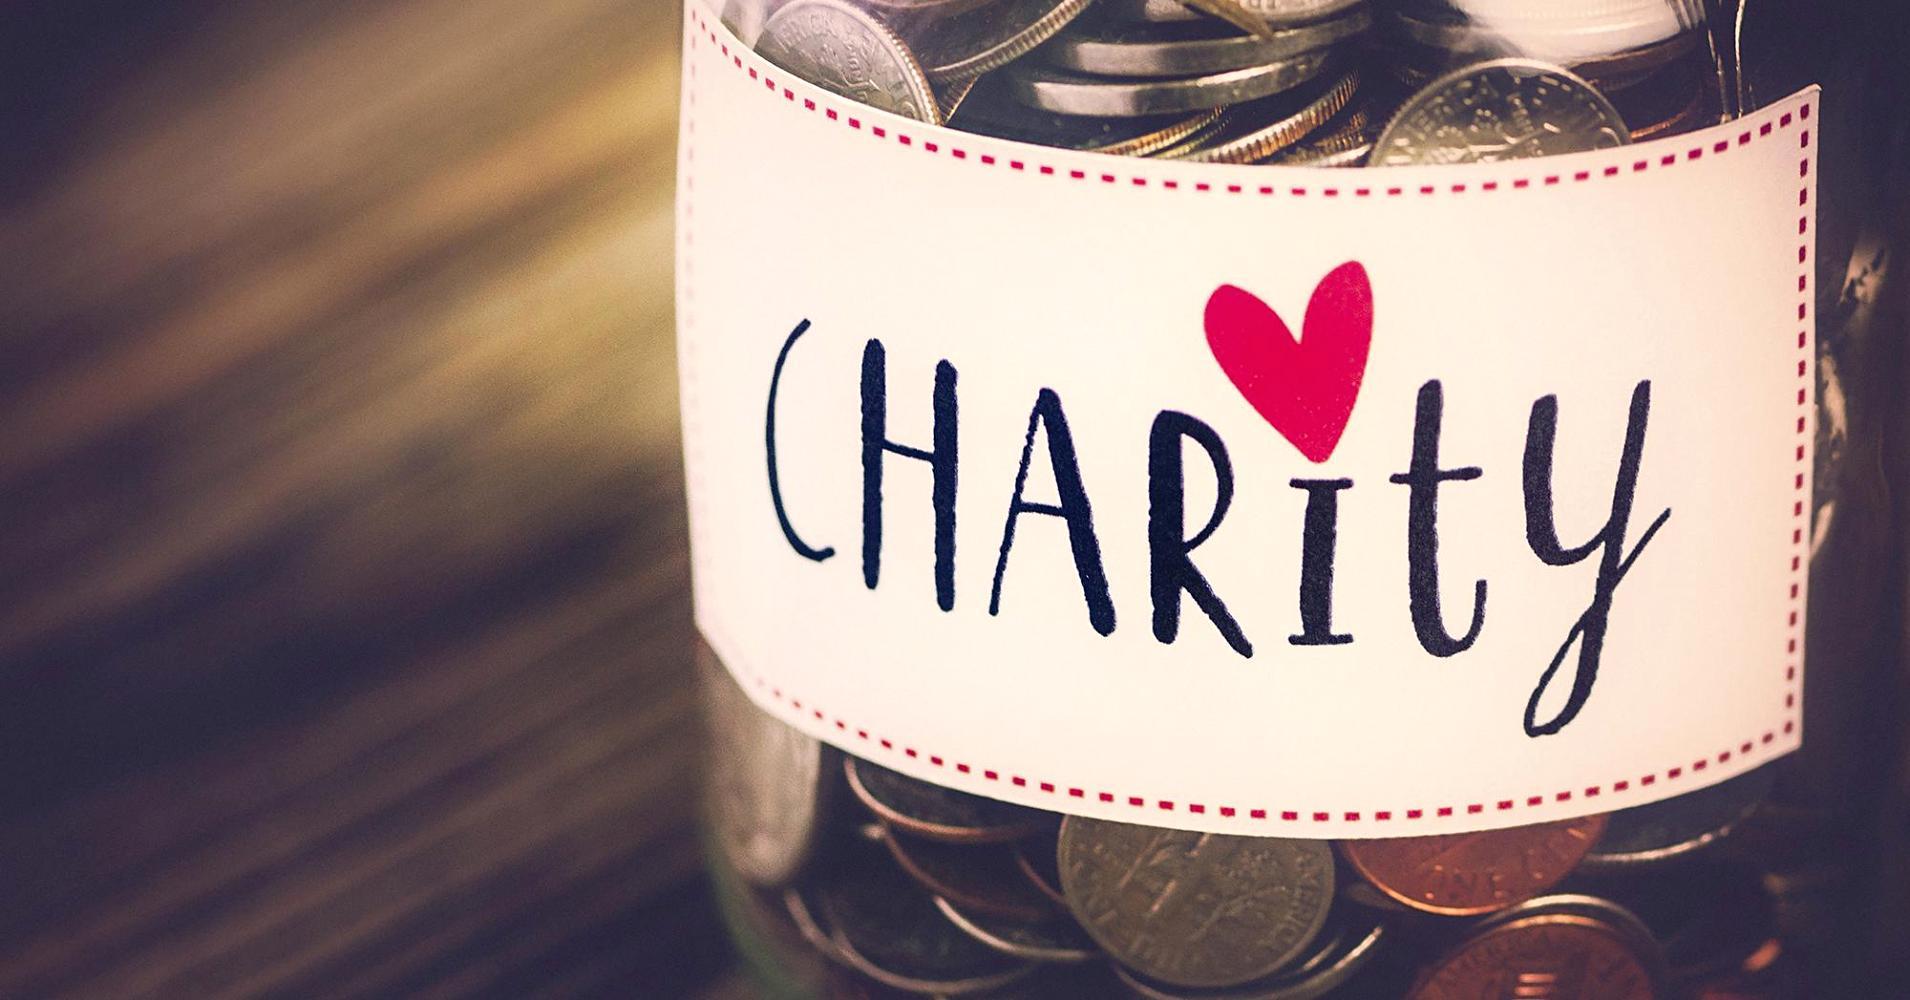 charity-brand-company